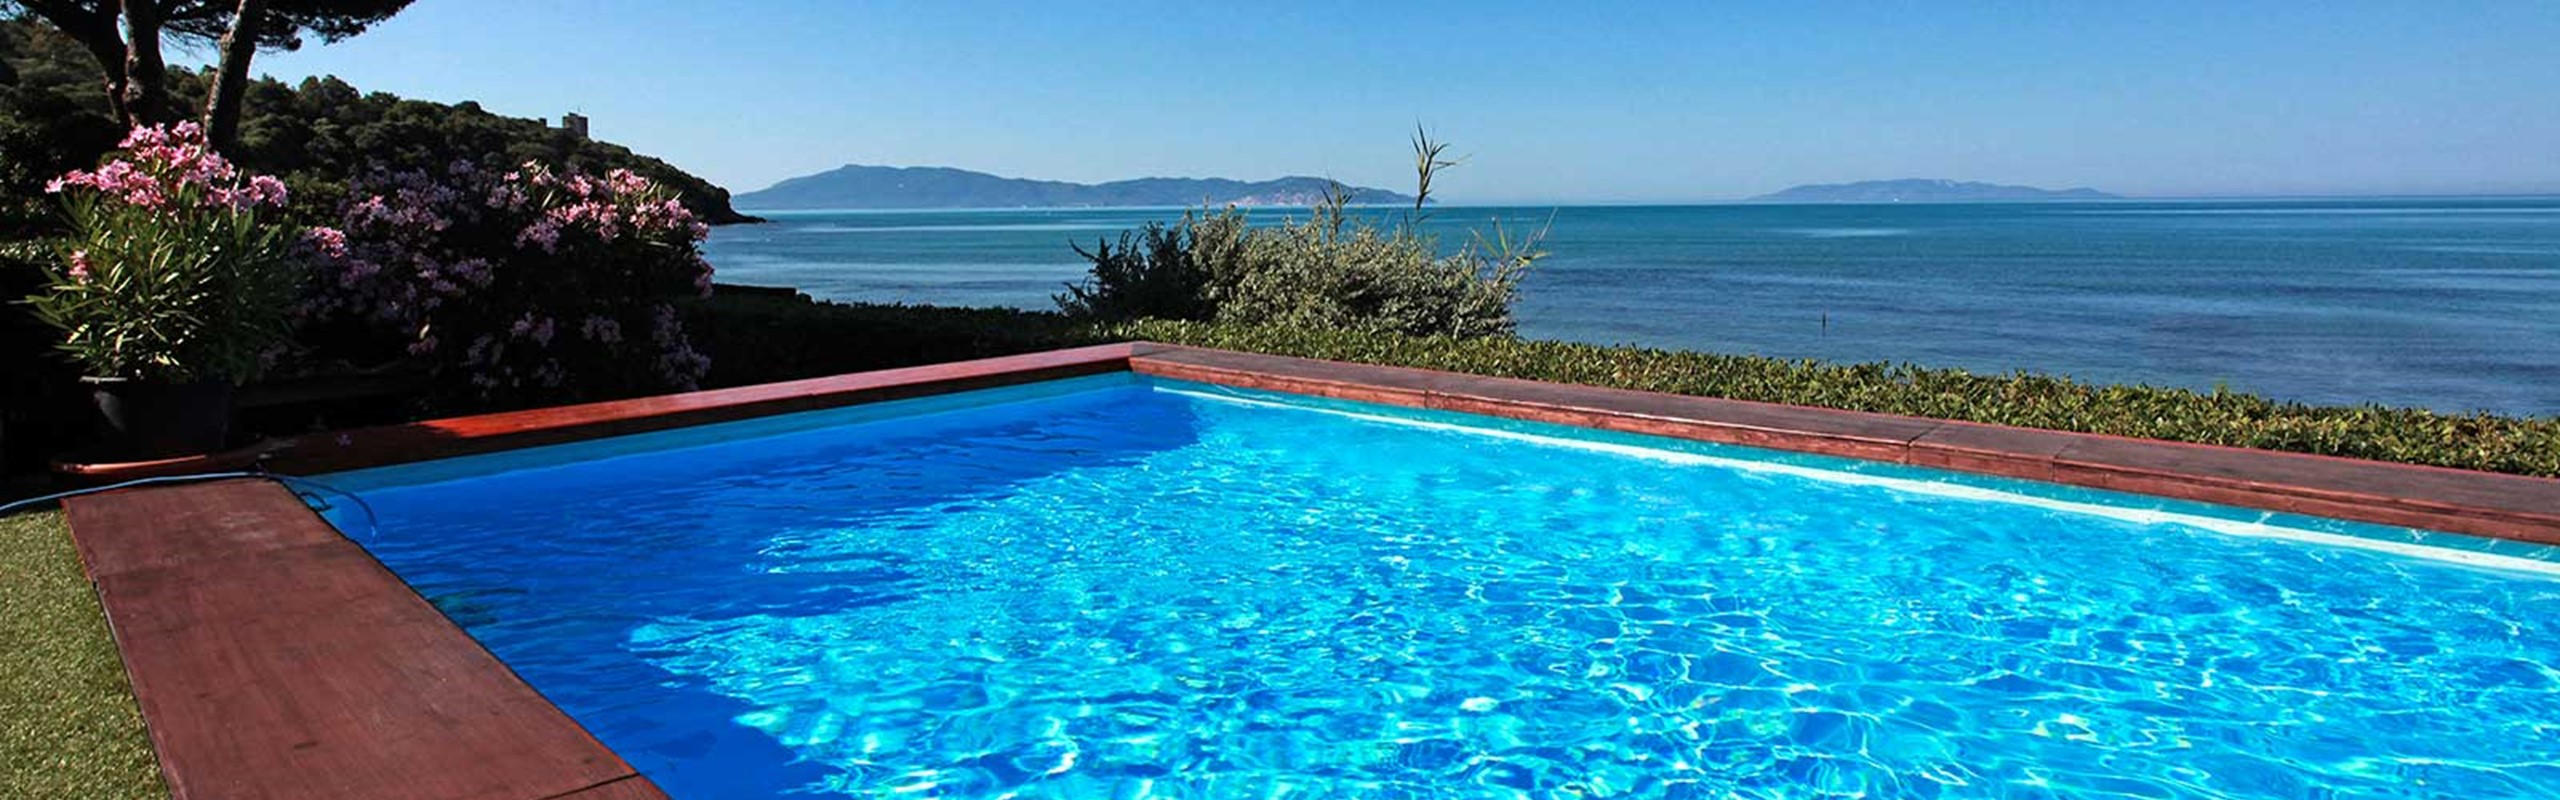 Tuscan Coast 1